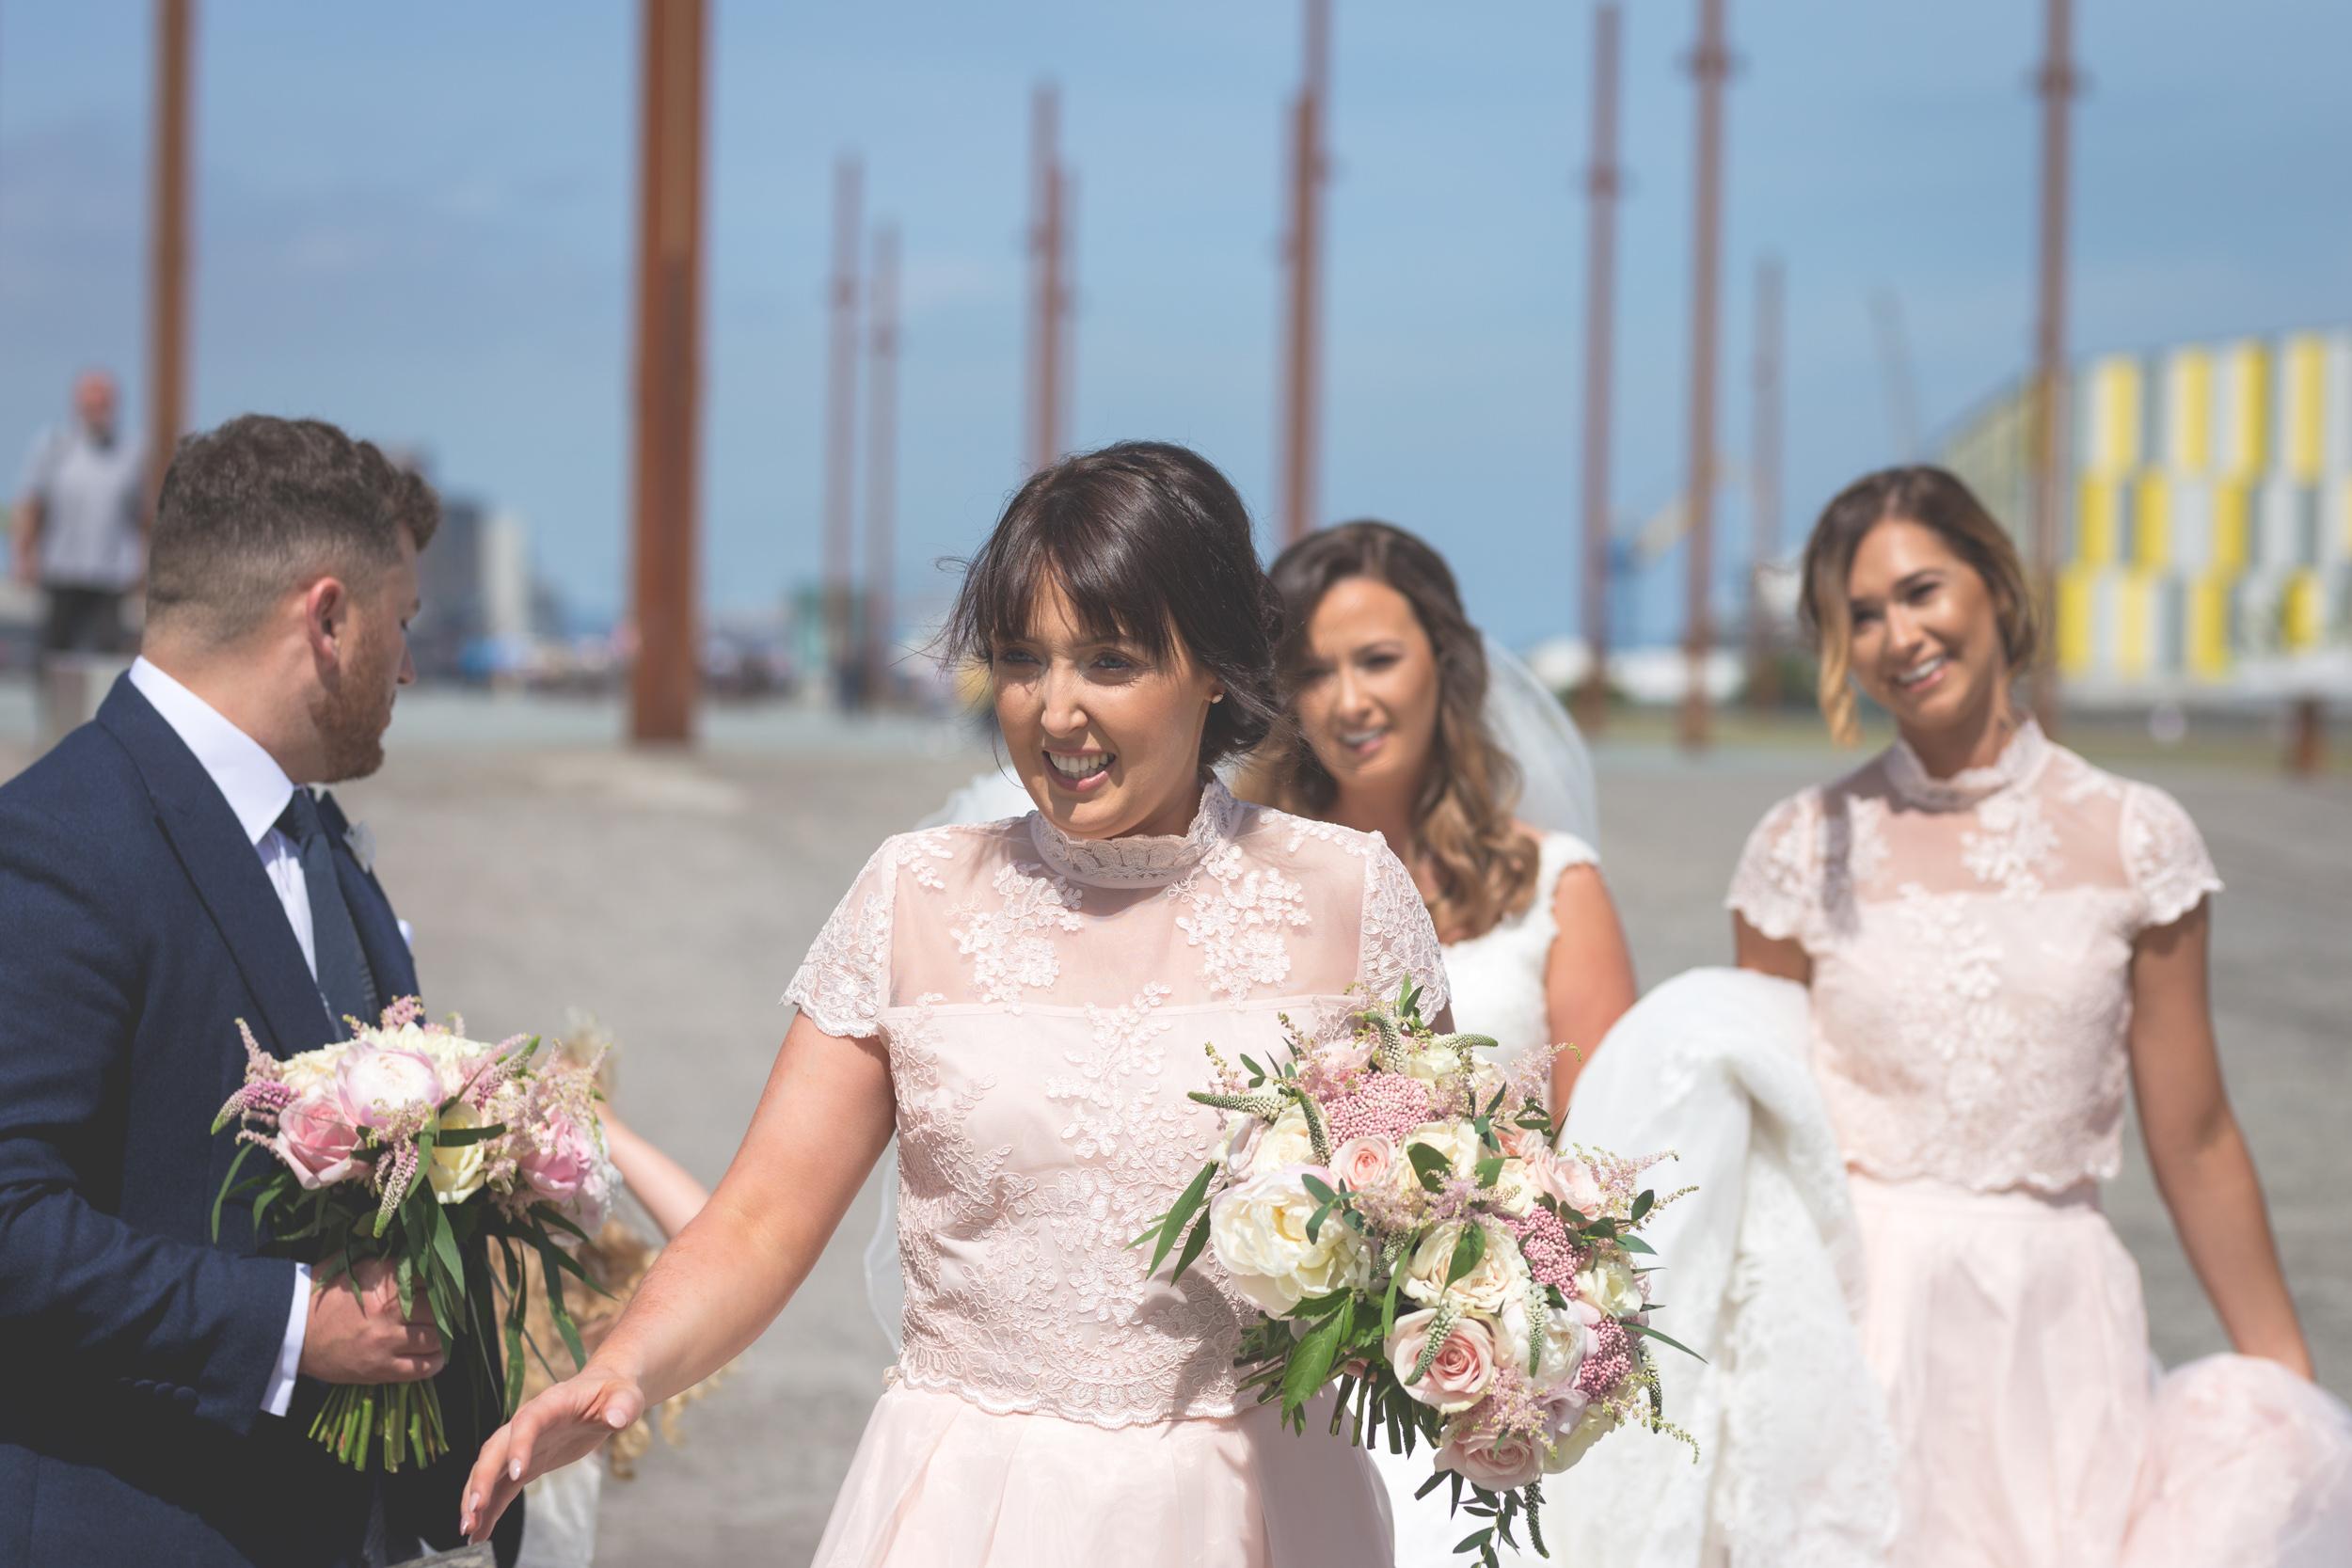 Brian McEwan   Northern Ireland Wedding Photographer   Rebecca & Michael   Portraits-55.jpg